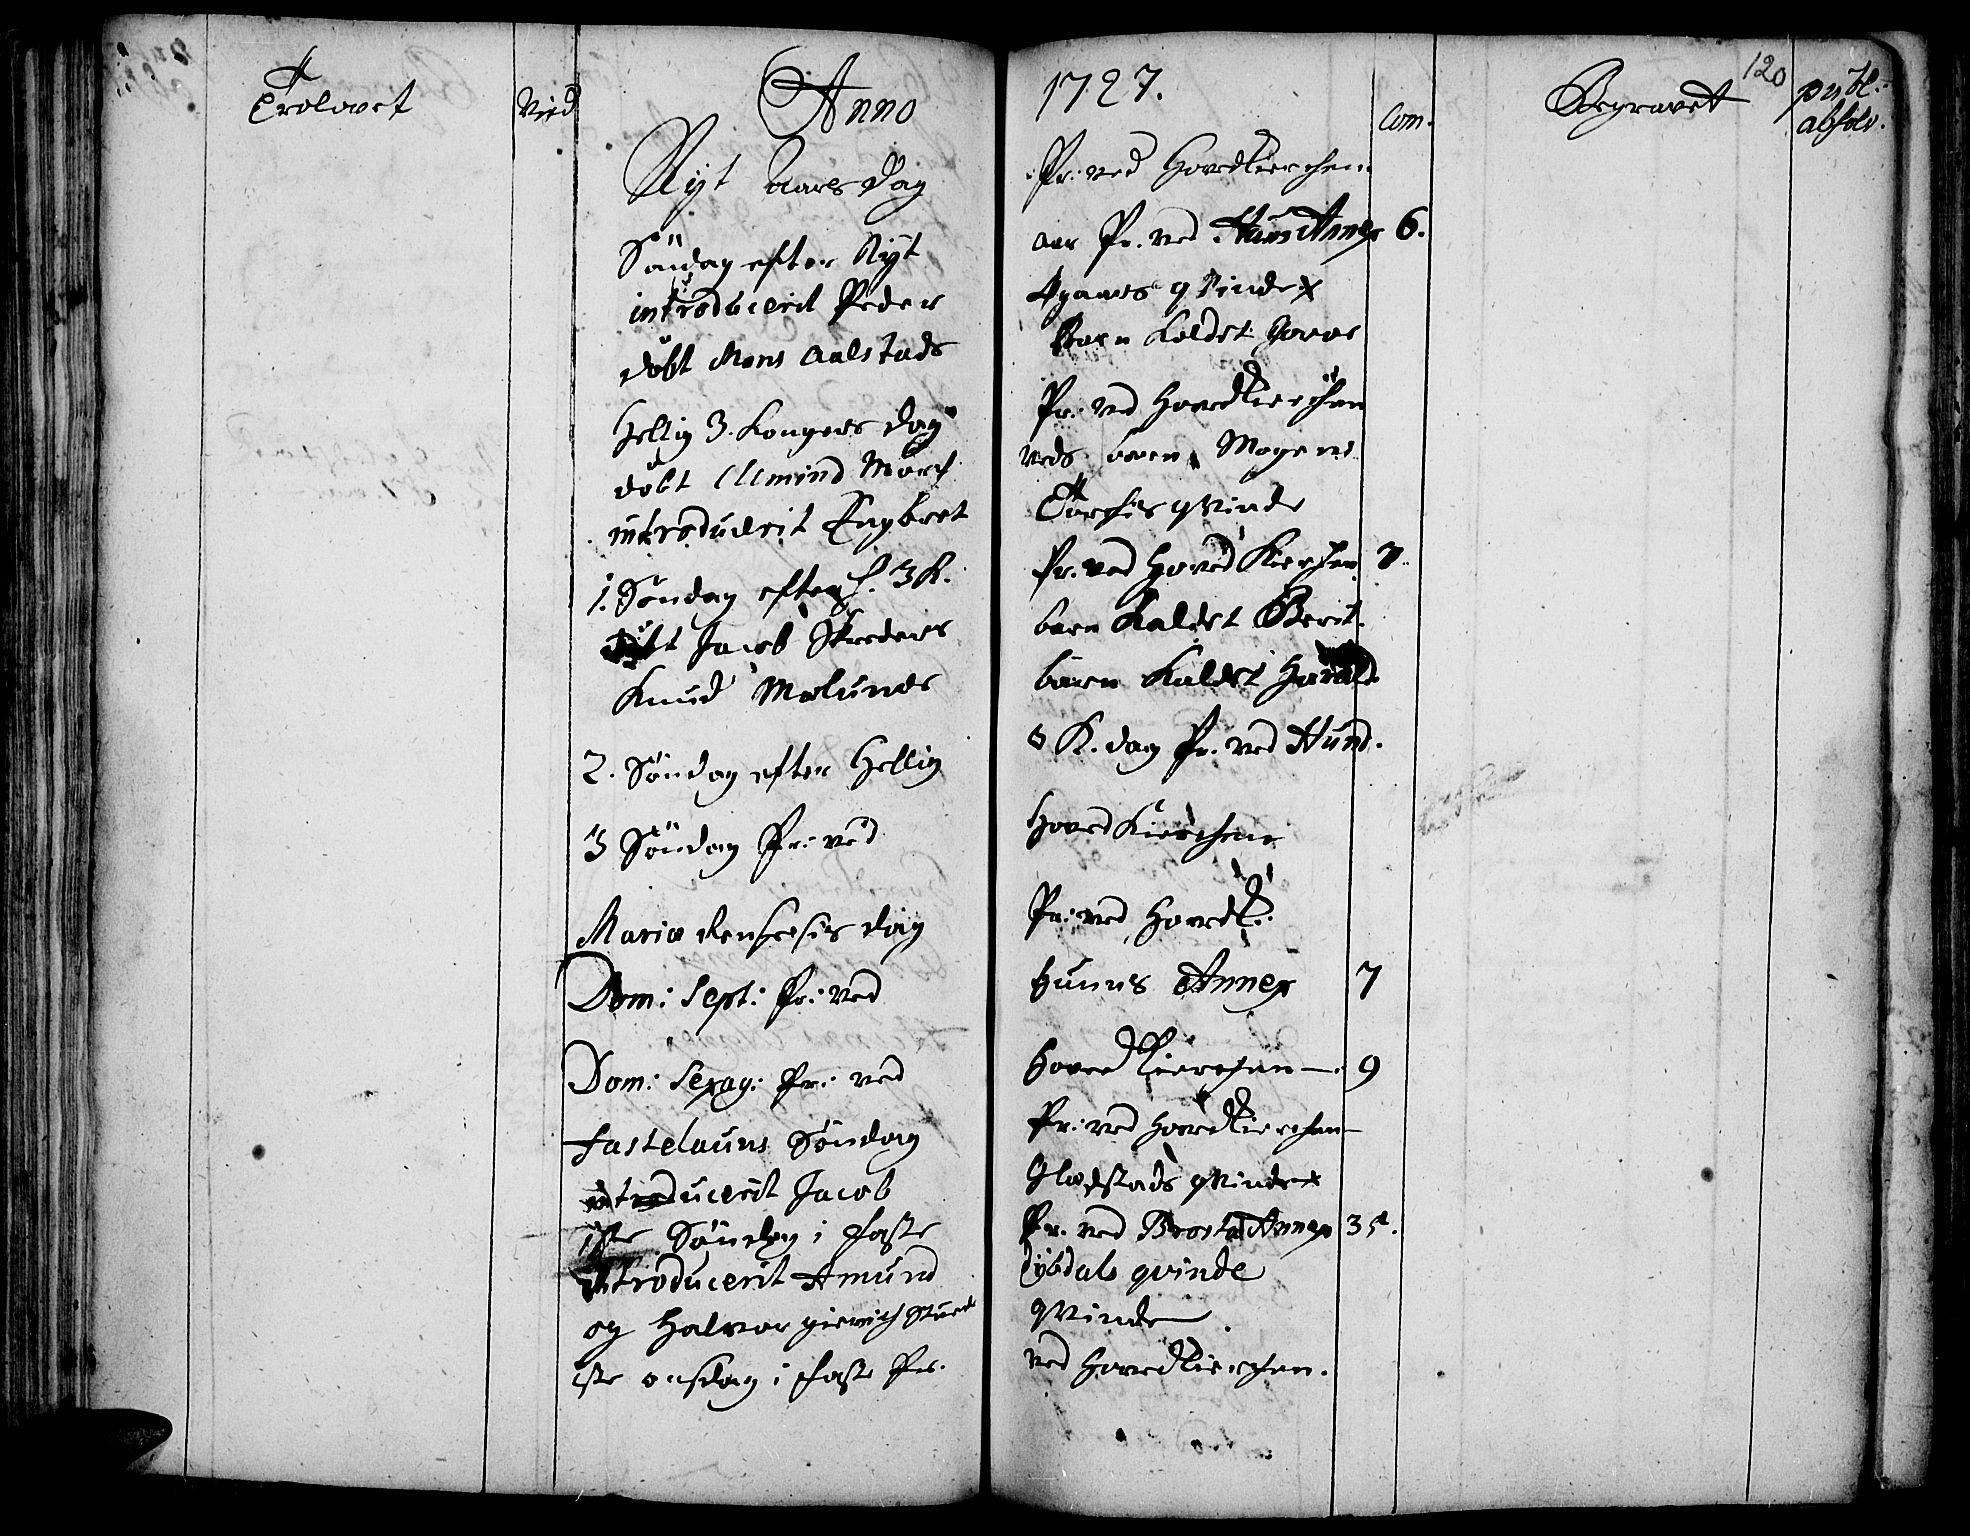 SAH, Vardal prestekontor, H/Ha/Haa/L0001: Ministerialbok nr. 1, 1706-1748, s. 120